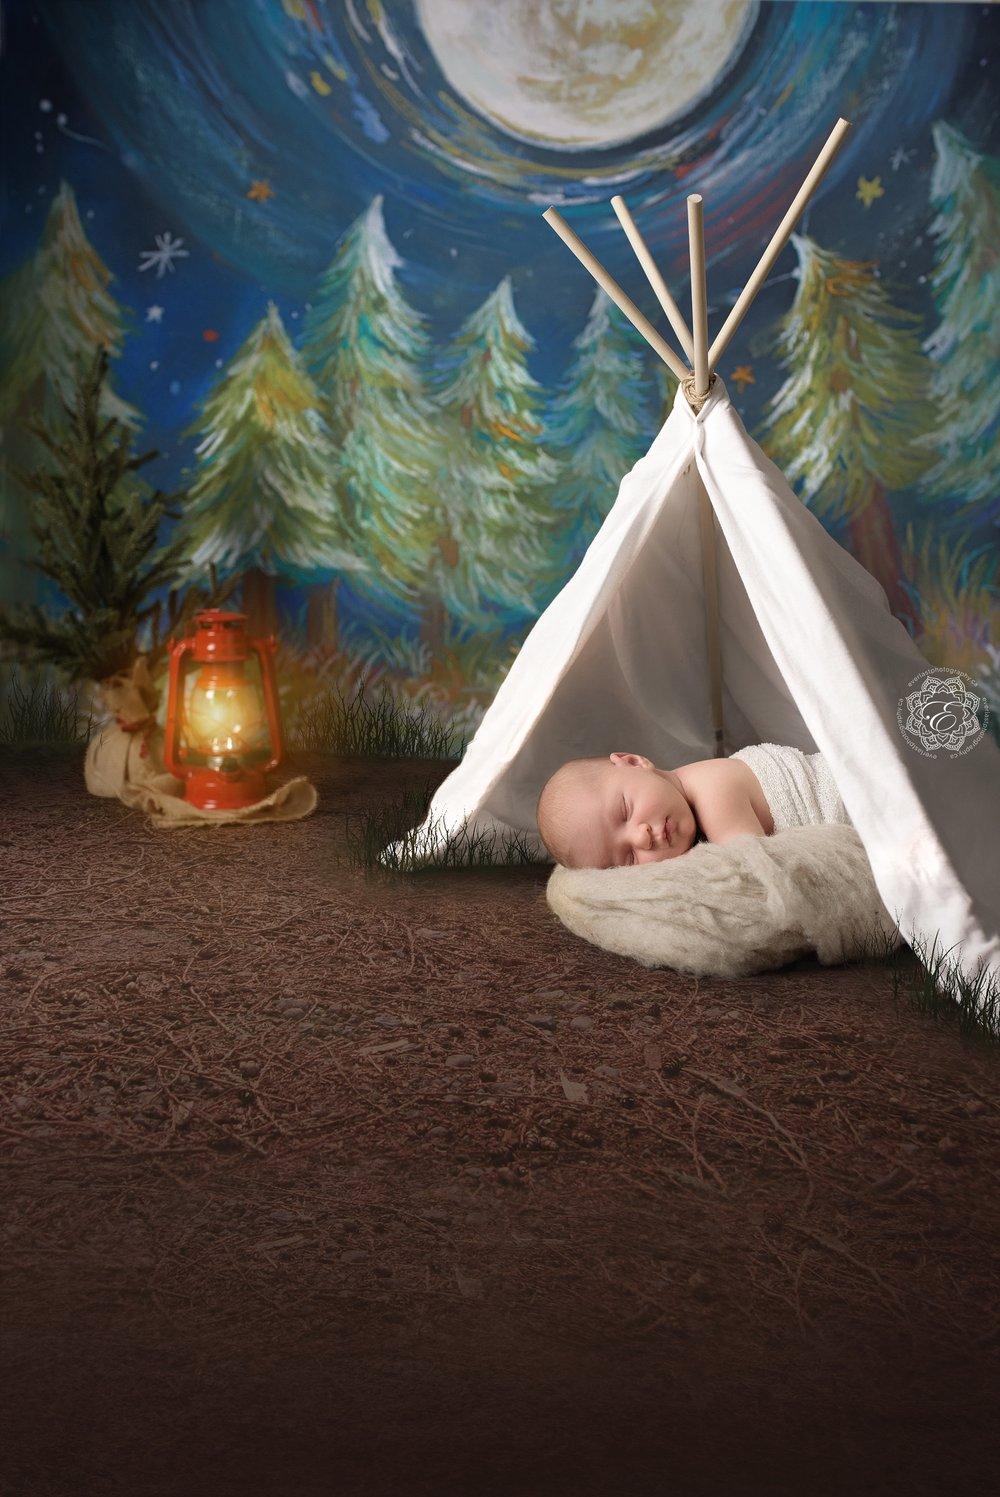 Newborn-baby-camping-in-tent.jpg